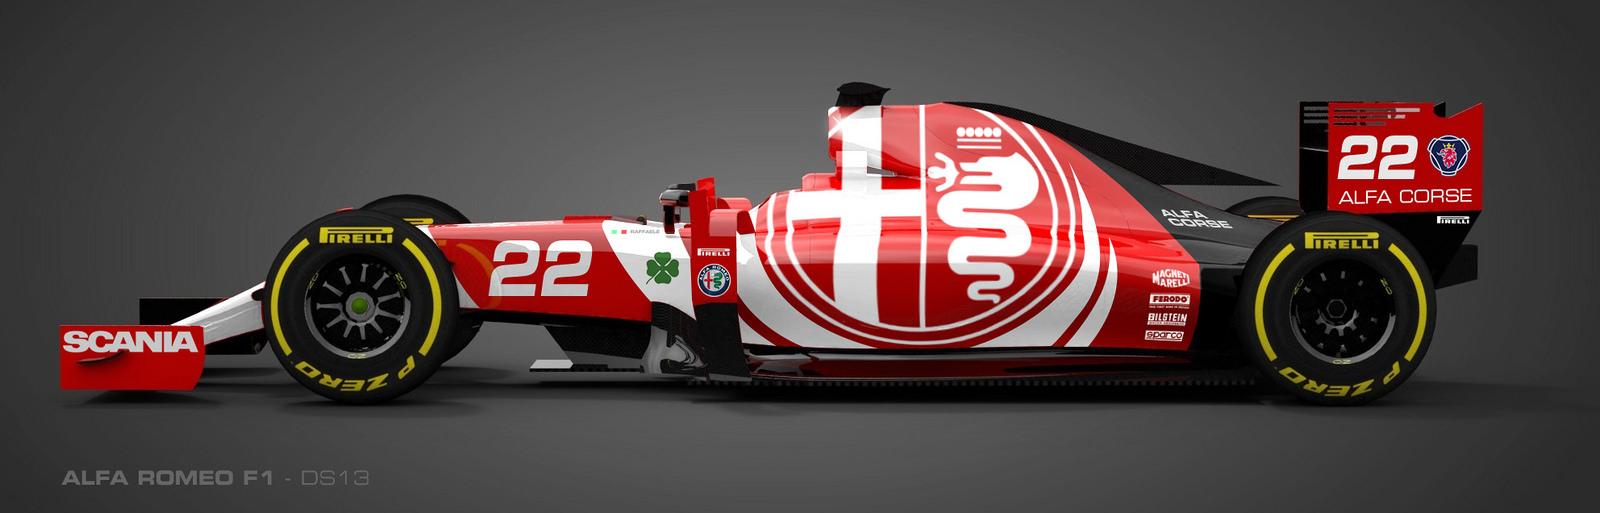 Alfa-Romeo-F1-Car-Photos-Concept-Design.jpg